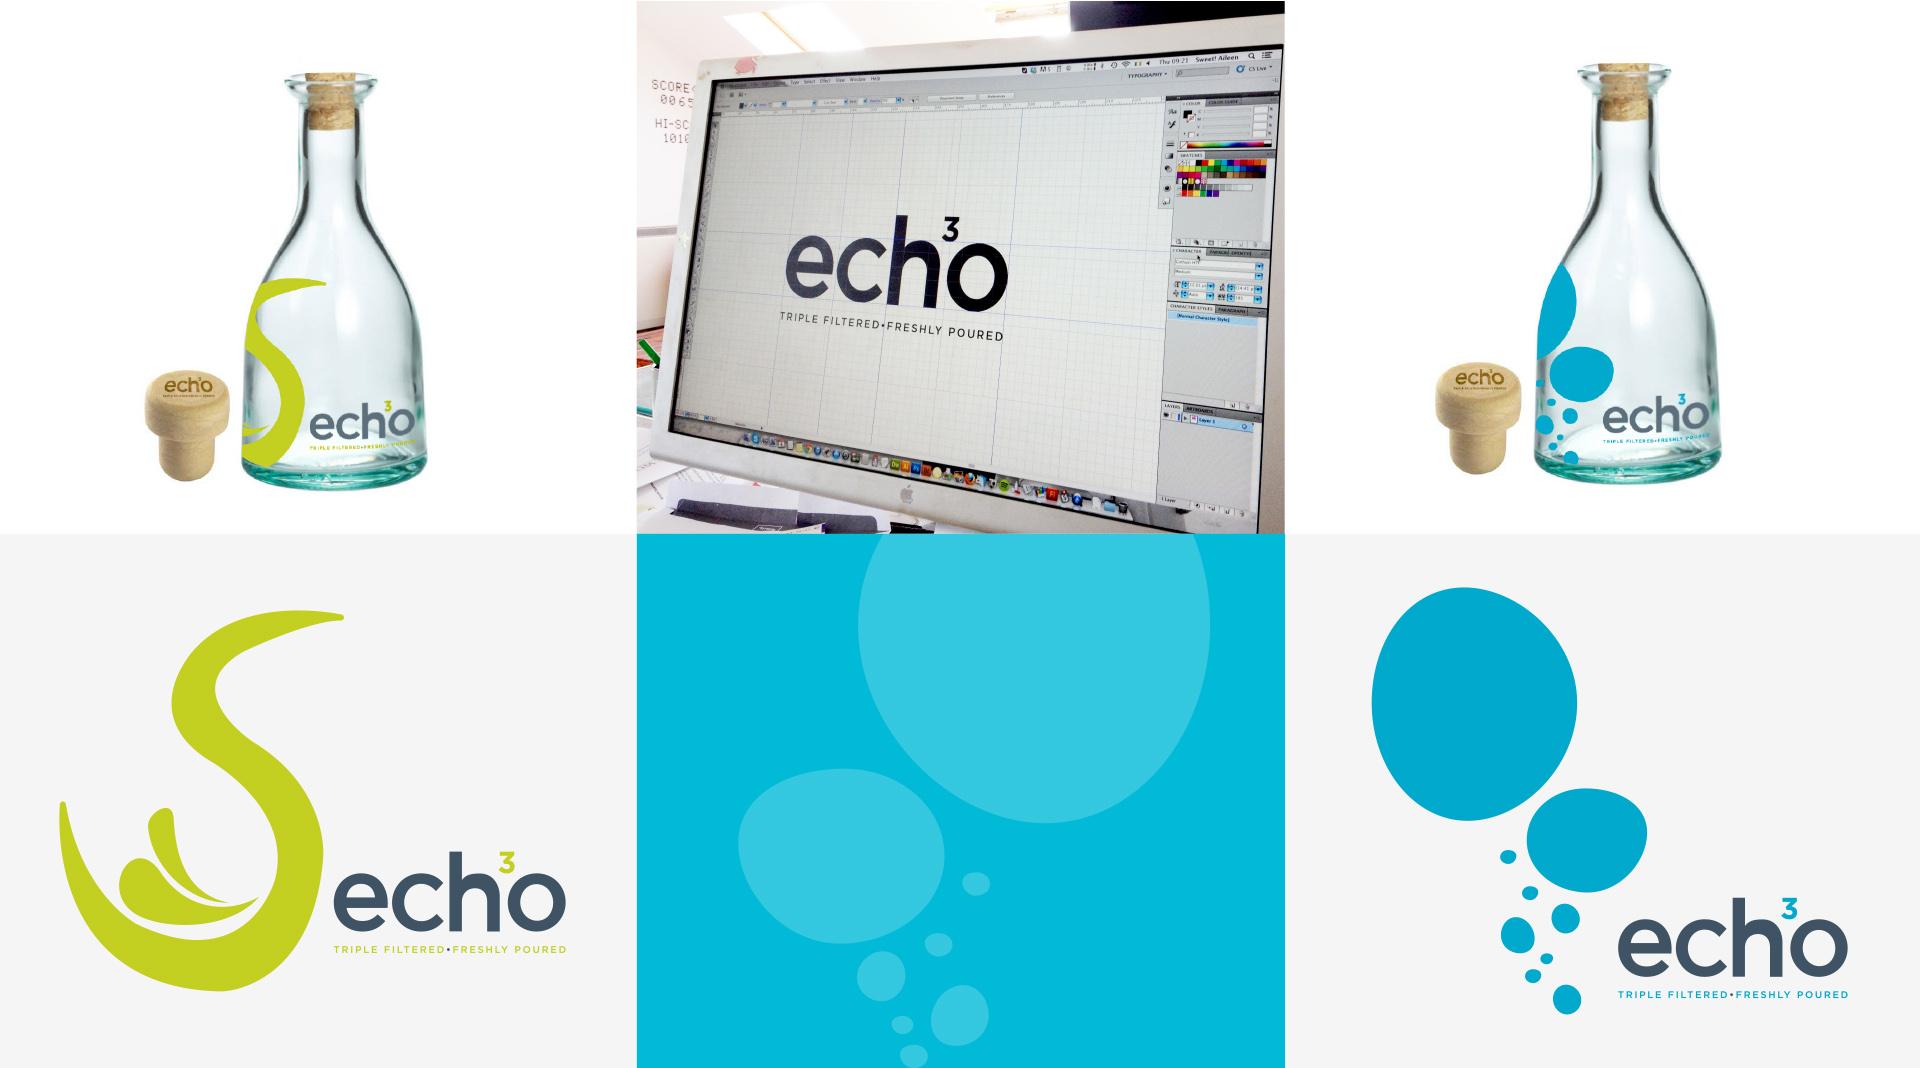 Echo Water bottle design and branding elements.